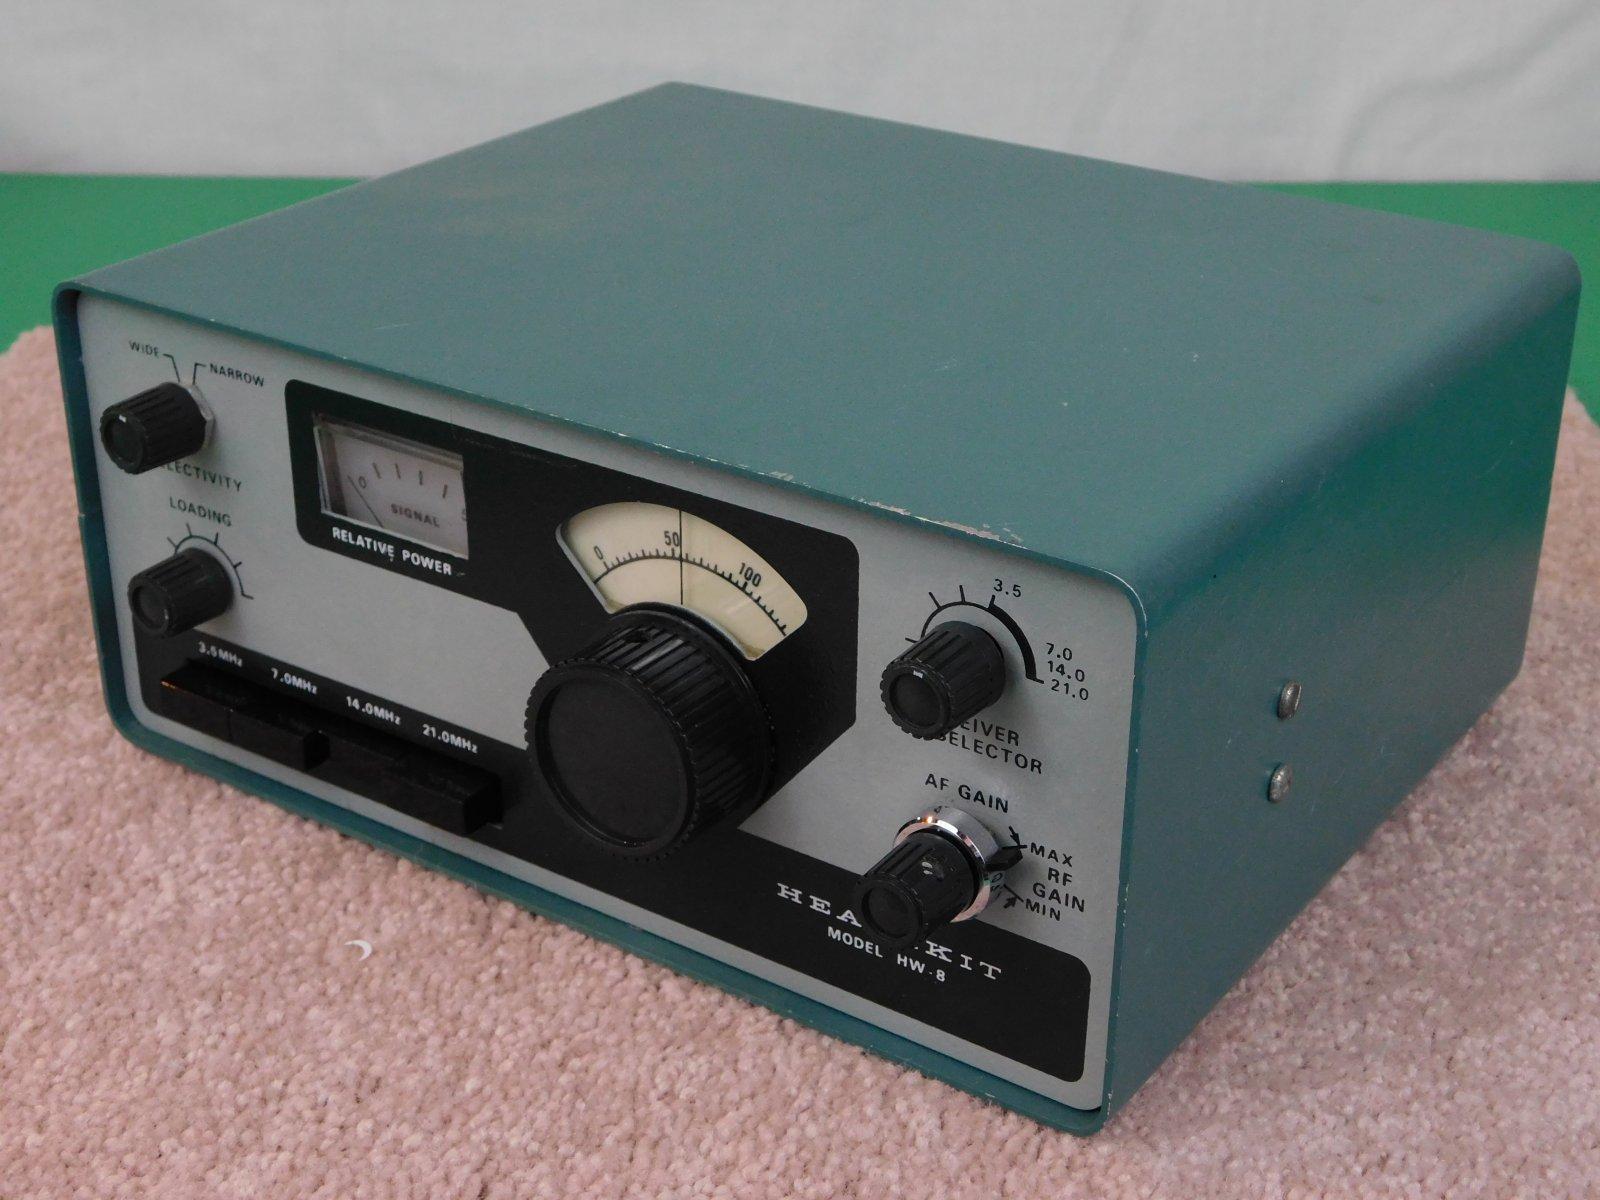 [Heathkit SB-104 Transceiver]